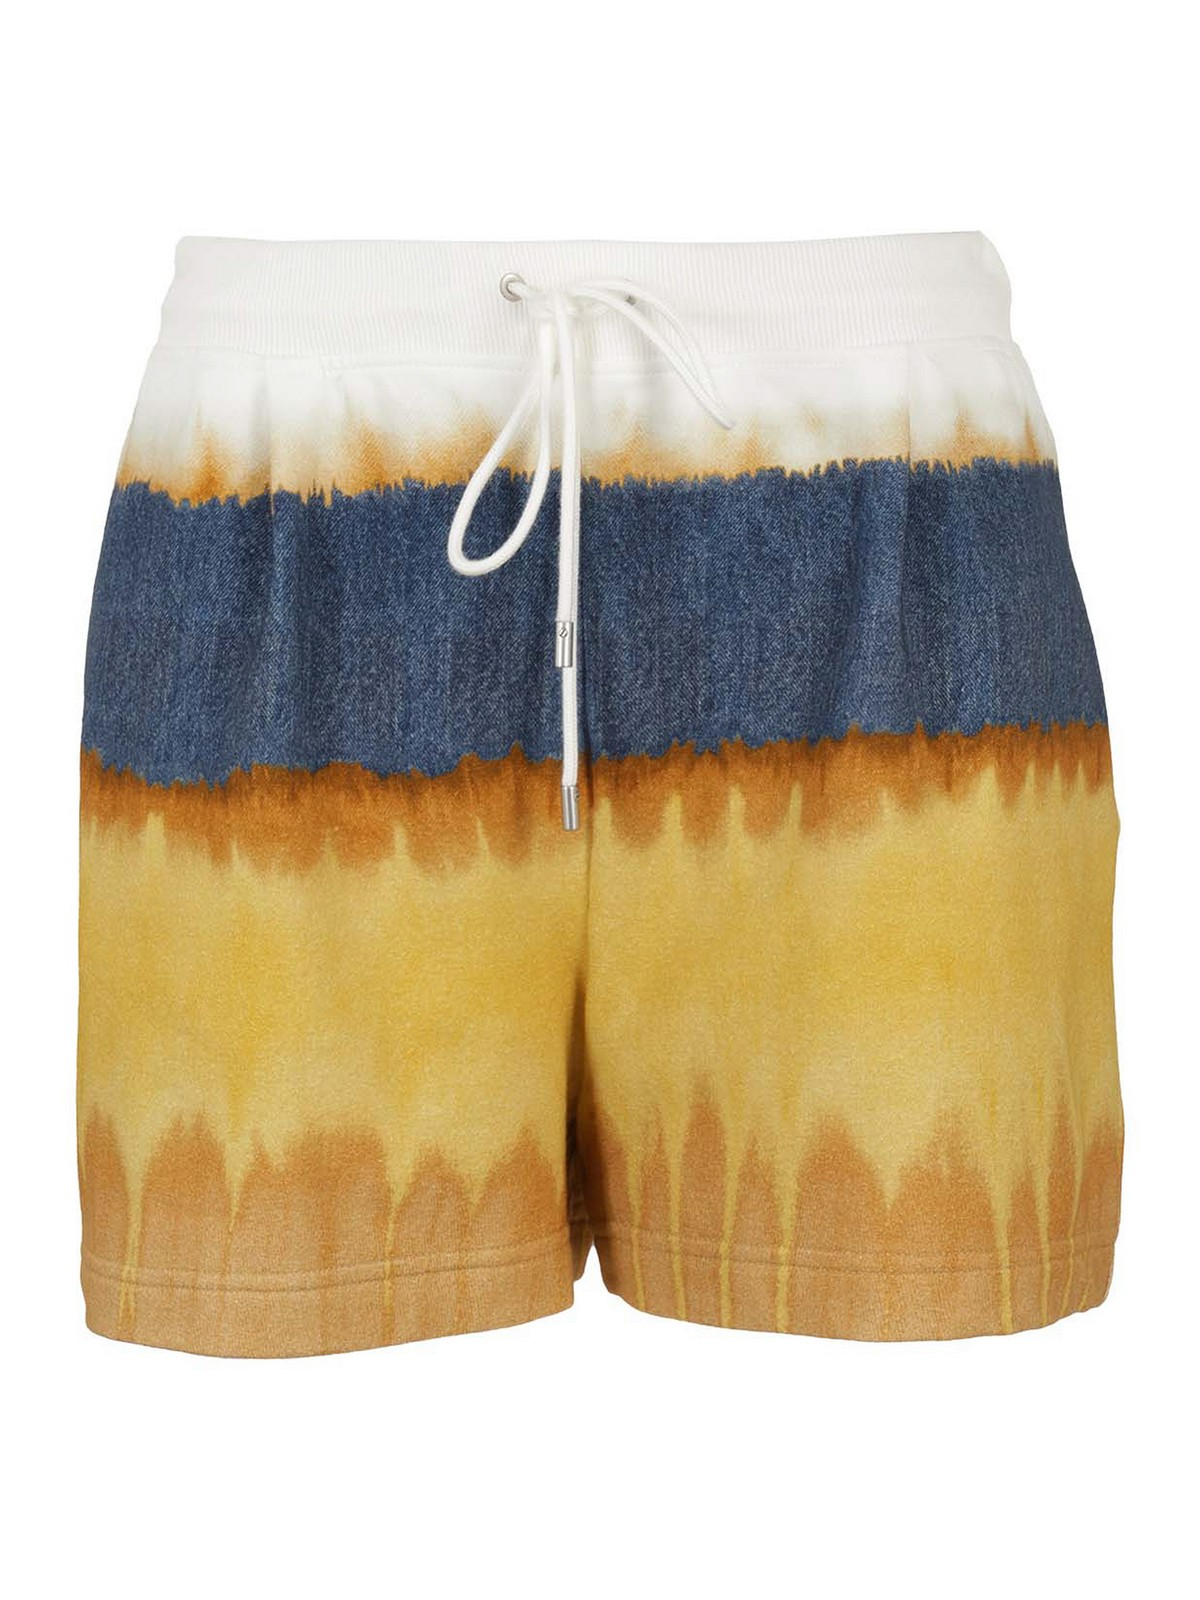 Alberta Ferretti Shorts TRI-COLOURED COTTON SHORTS